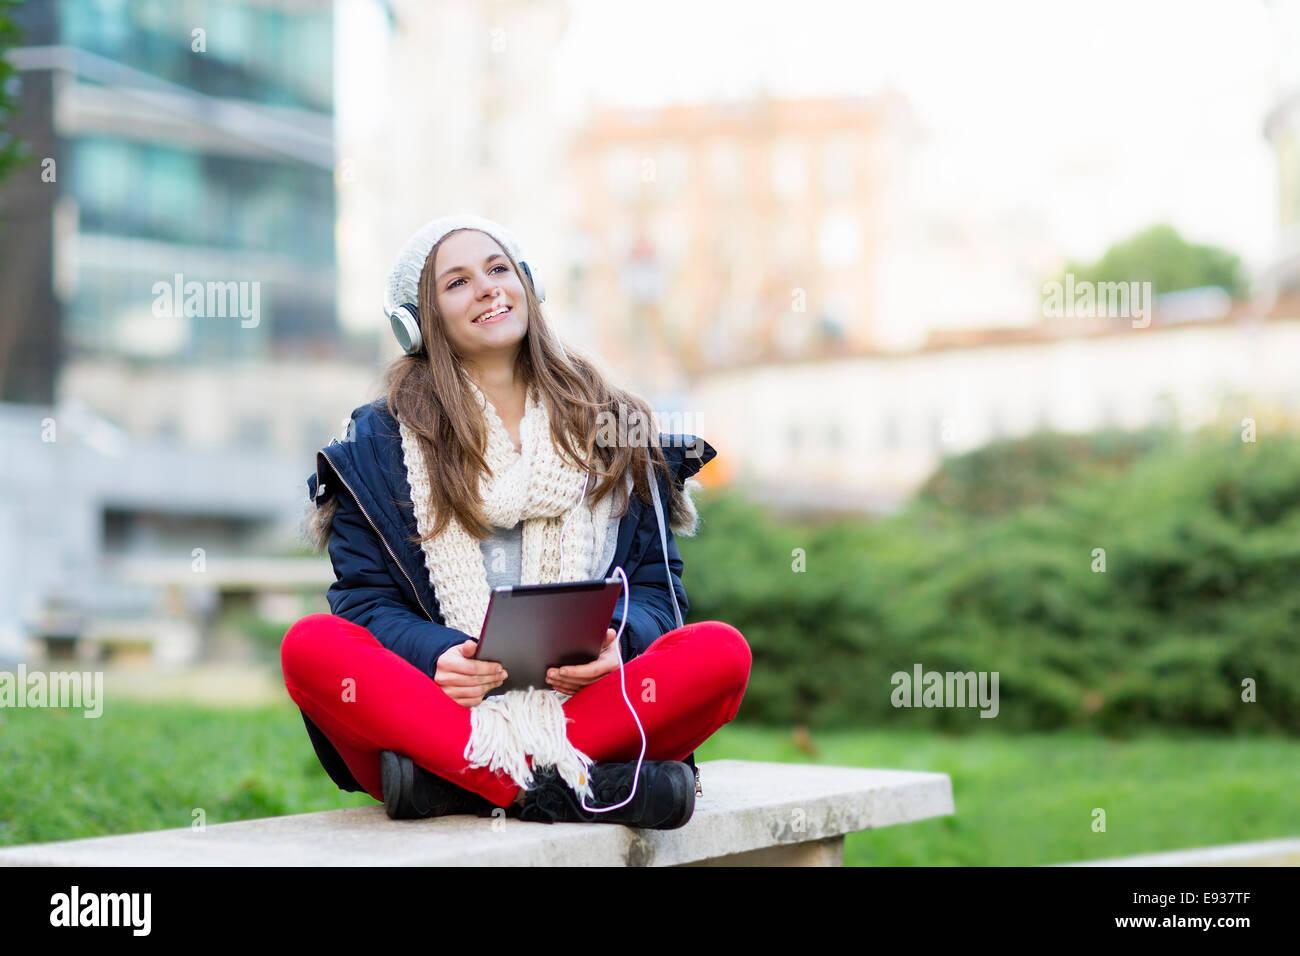 Porträt von Teenager-Mädchen Musik hören Stockbild